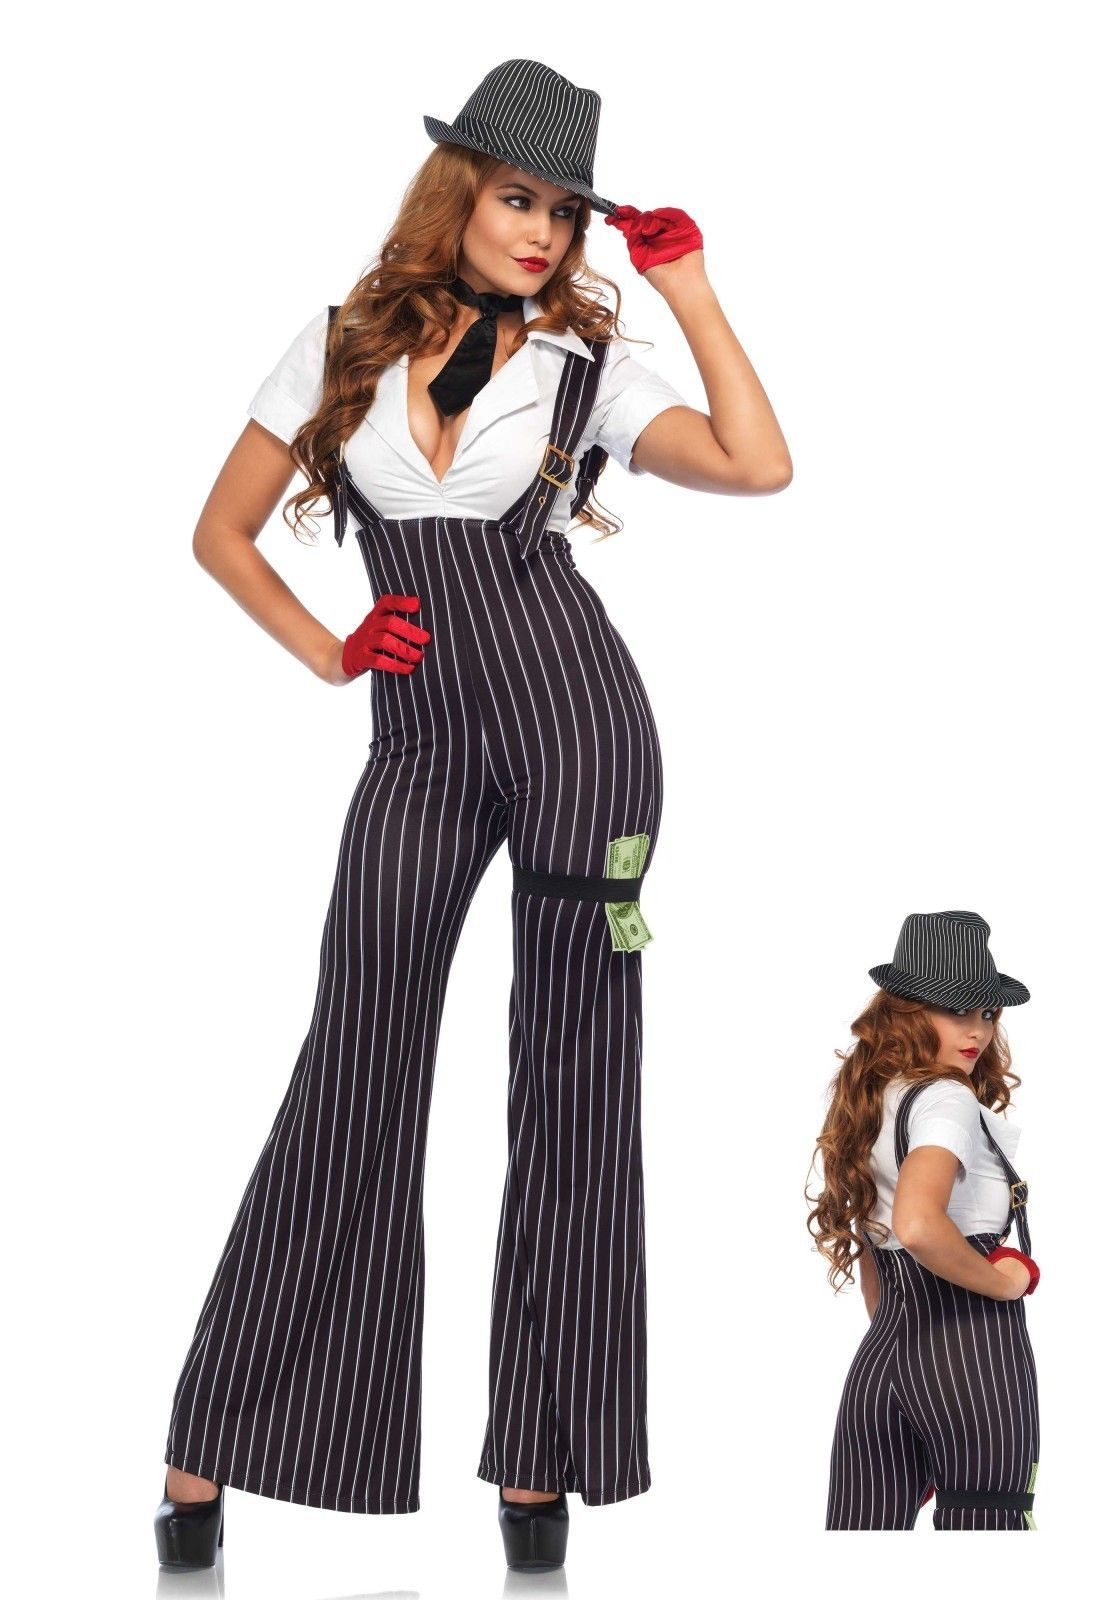 Leg Avenue mafia kostuum dames Brass knuckle Babe 3 Delig Brass Knuckle  Babe kostuum set. Krijtstreep catsuit fcfb31dc6ad